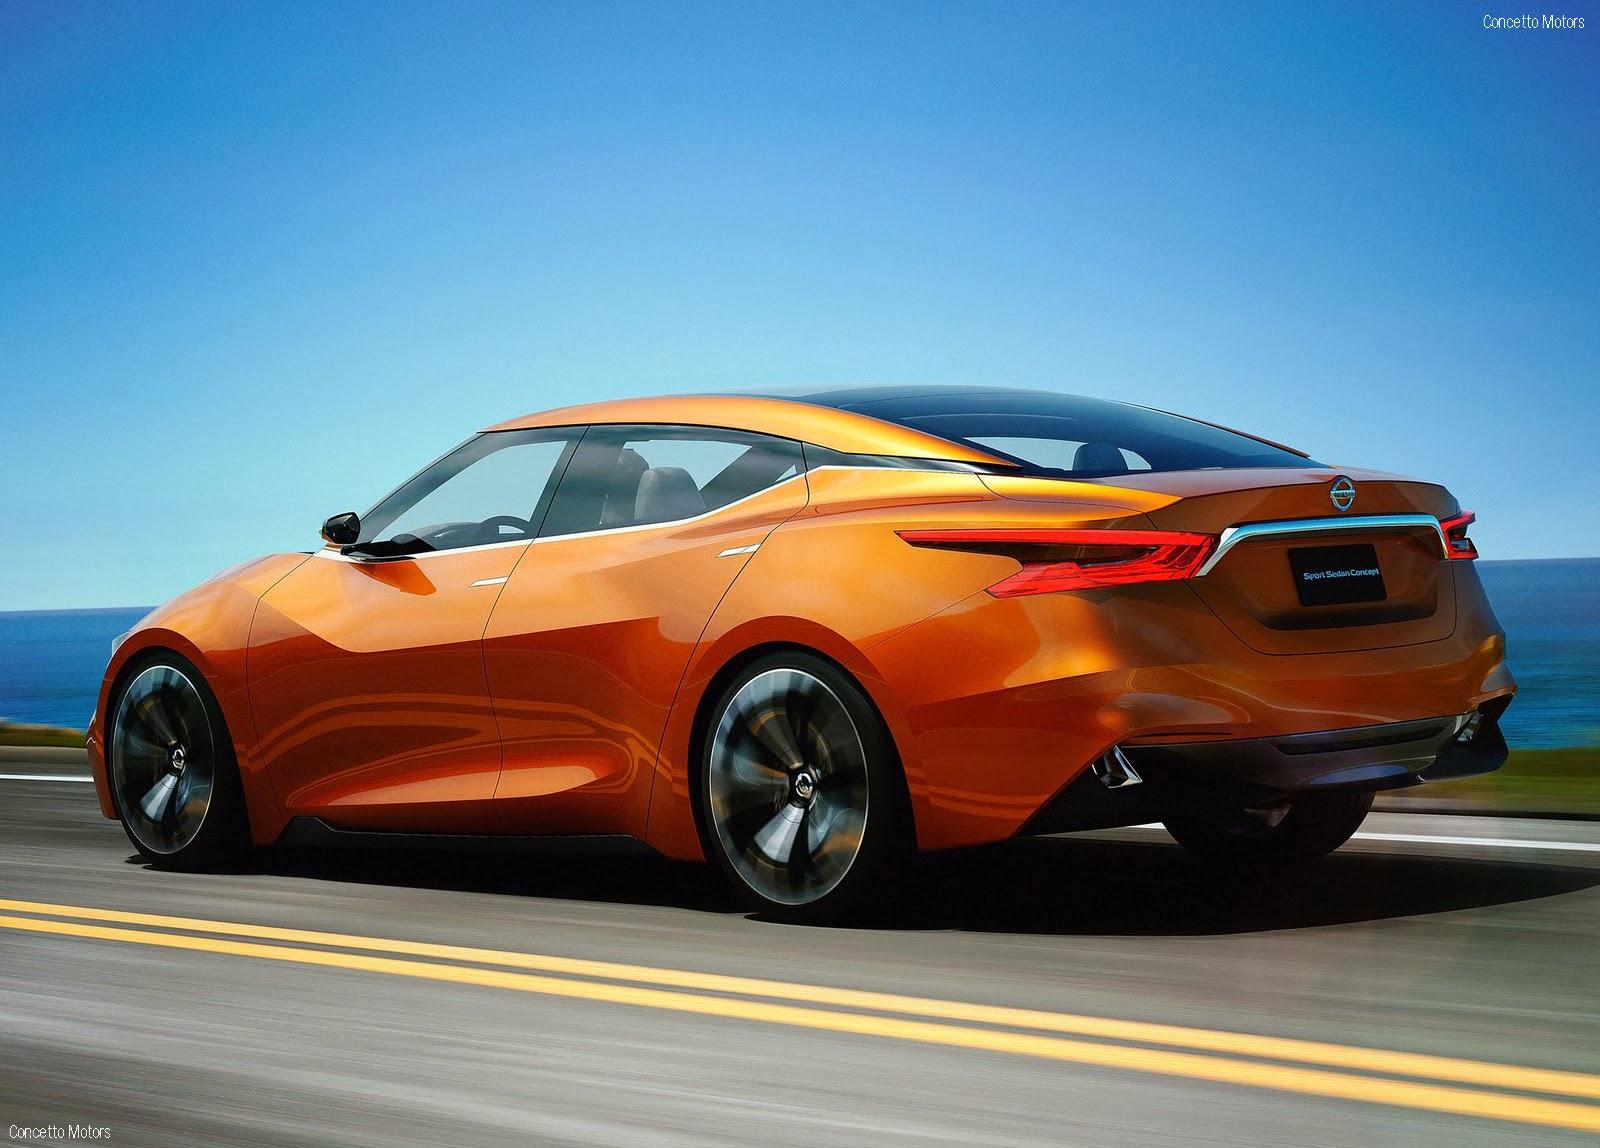 Sport Sedan Concept Enfatiza Design De Ultima Geracao E Estilo